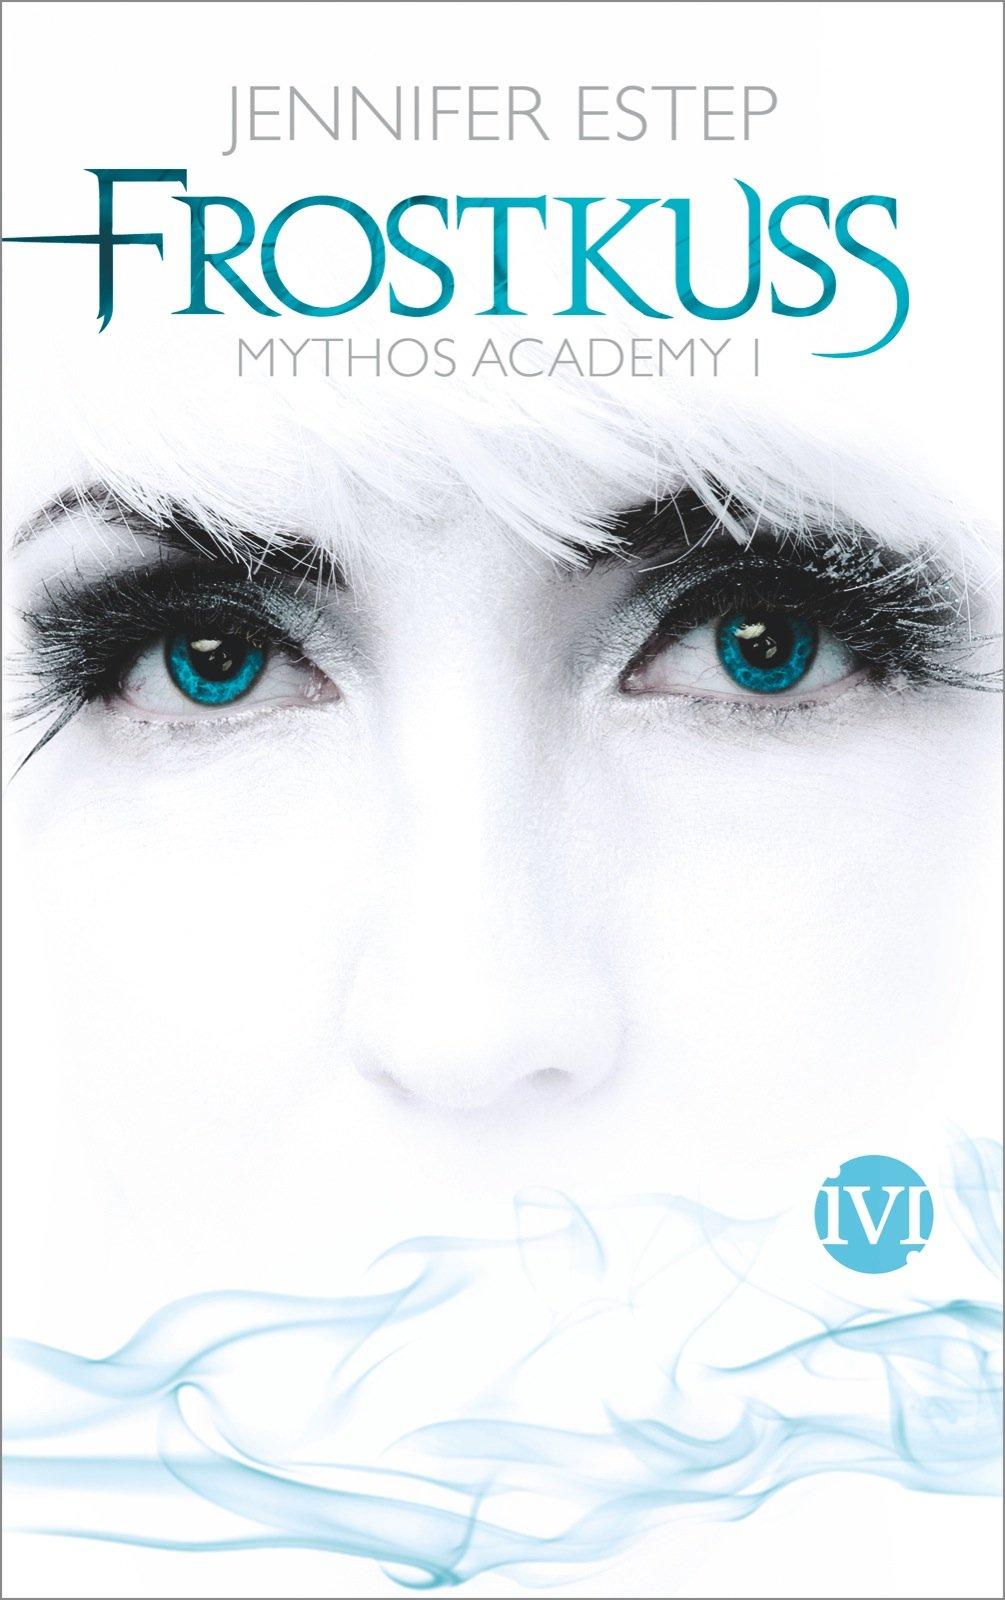 http://www.amazon.de/Frostkuss-Mythos-Academy-Jennifer-Estep/dp/349270249X/ref=sr_1_2?s=books&ie=UTF8&qid=1416240891&sr=1-2&keywords=mythos+academy